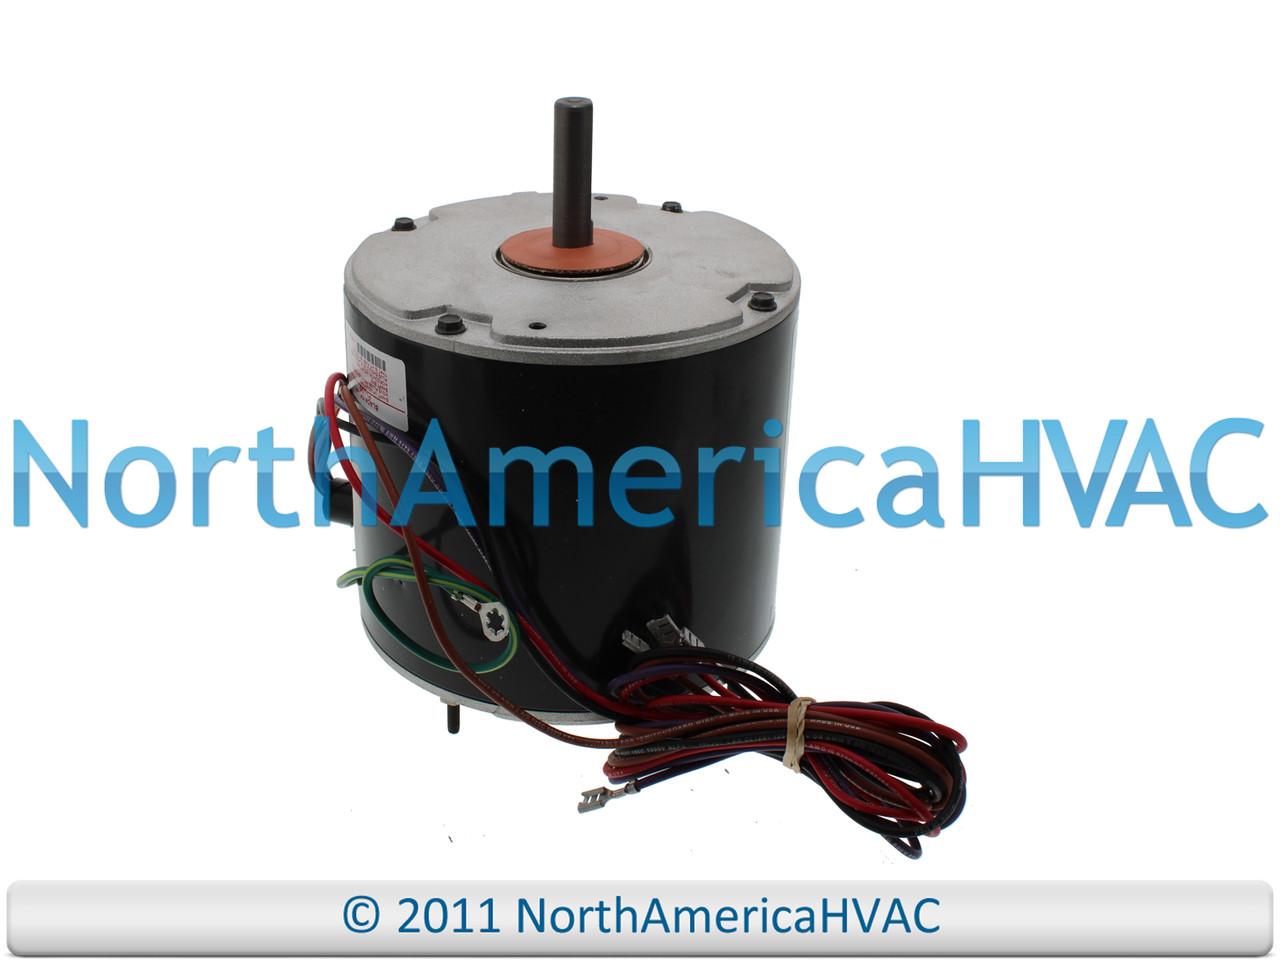 OEM Trane American Standard Blower Motor 1/5 HP MOT18923 - North America  HVACNorth America HVAC